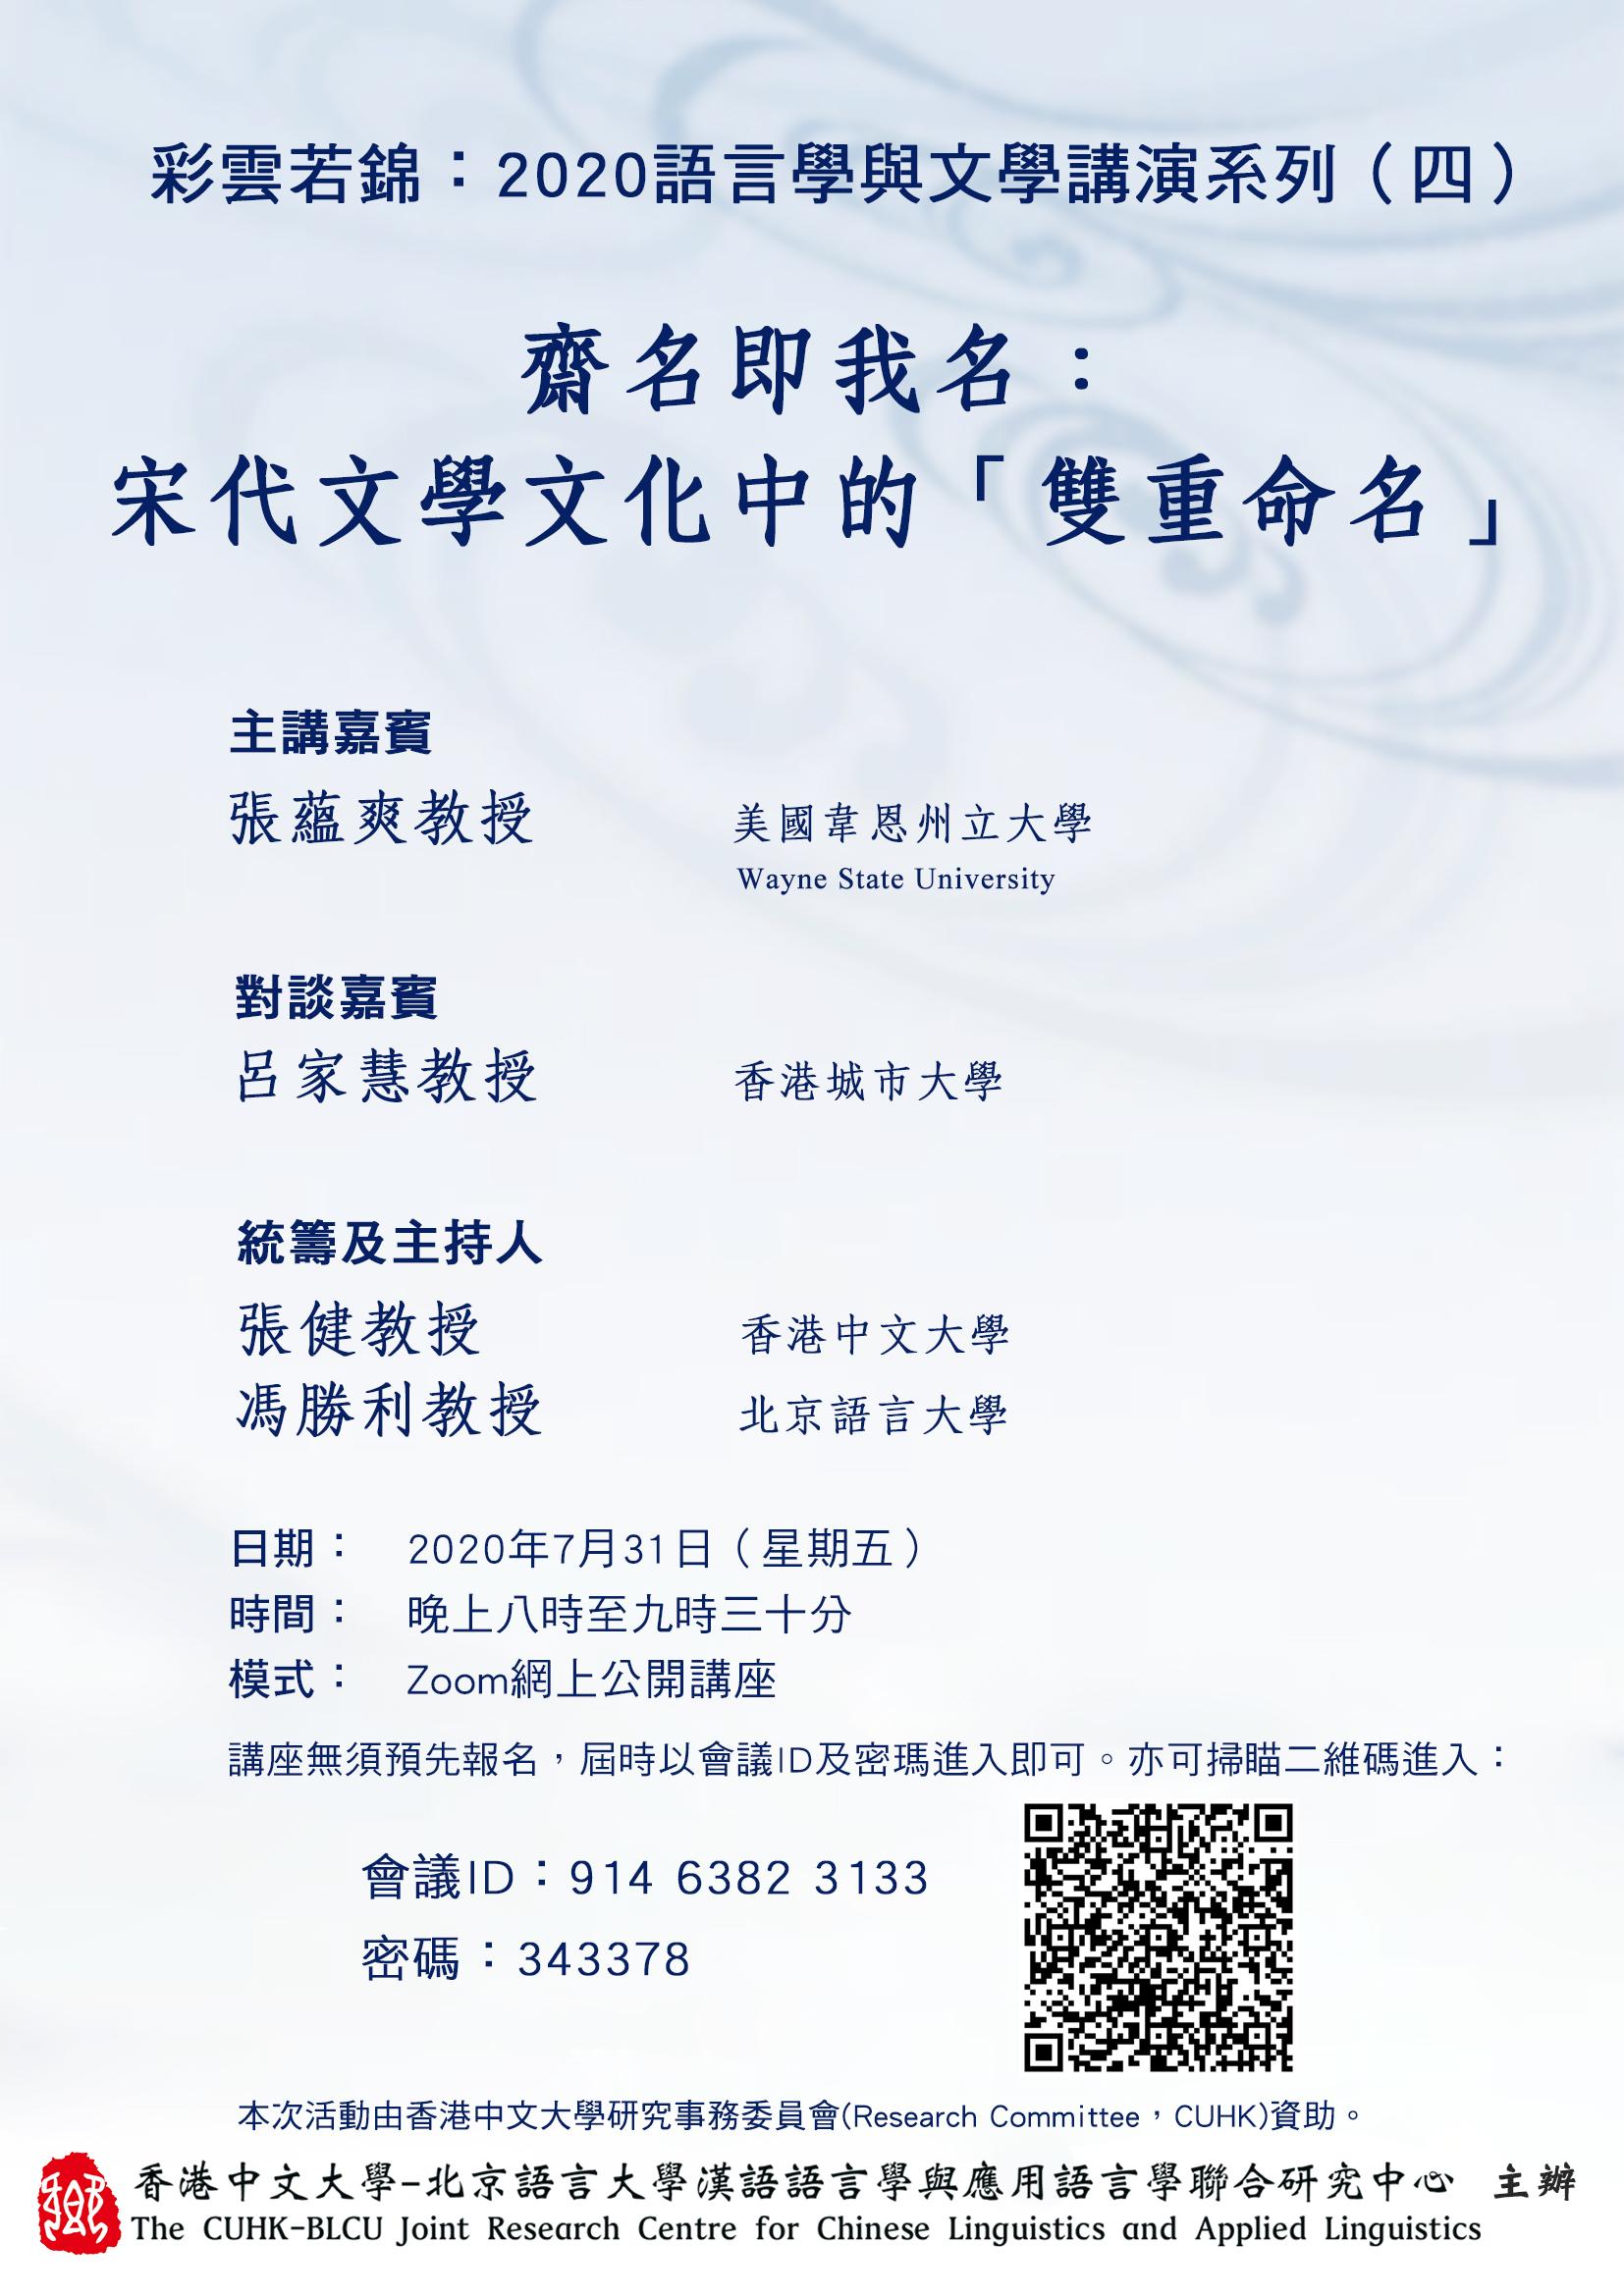 prof. zhang